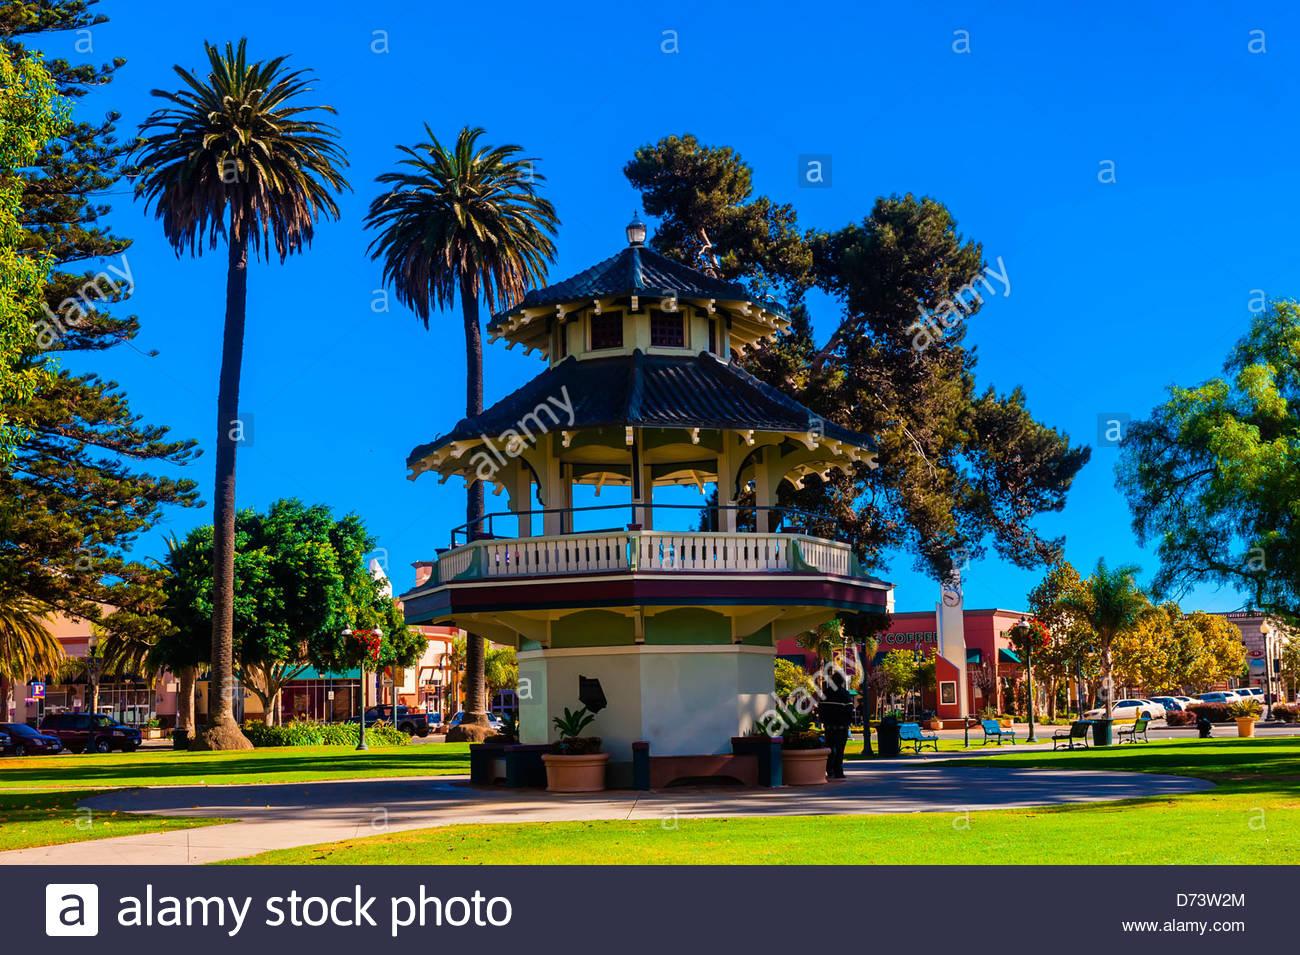 Oxnard California Stockfotos & Oxnard California Bilder - Alamy